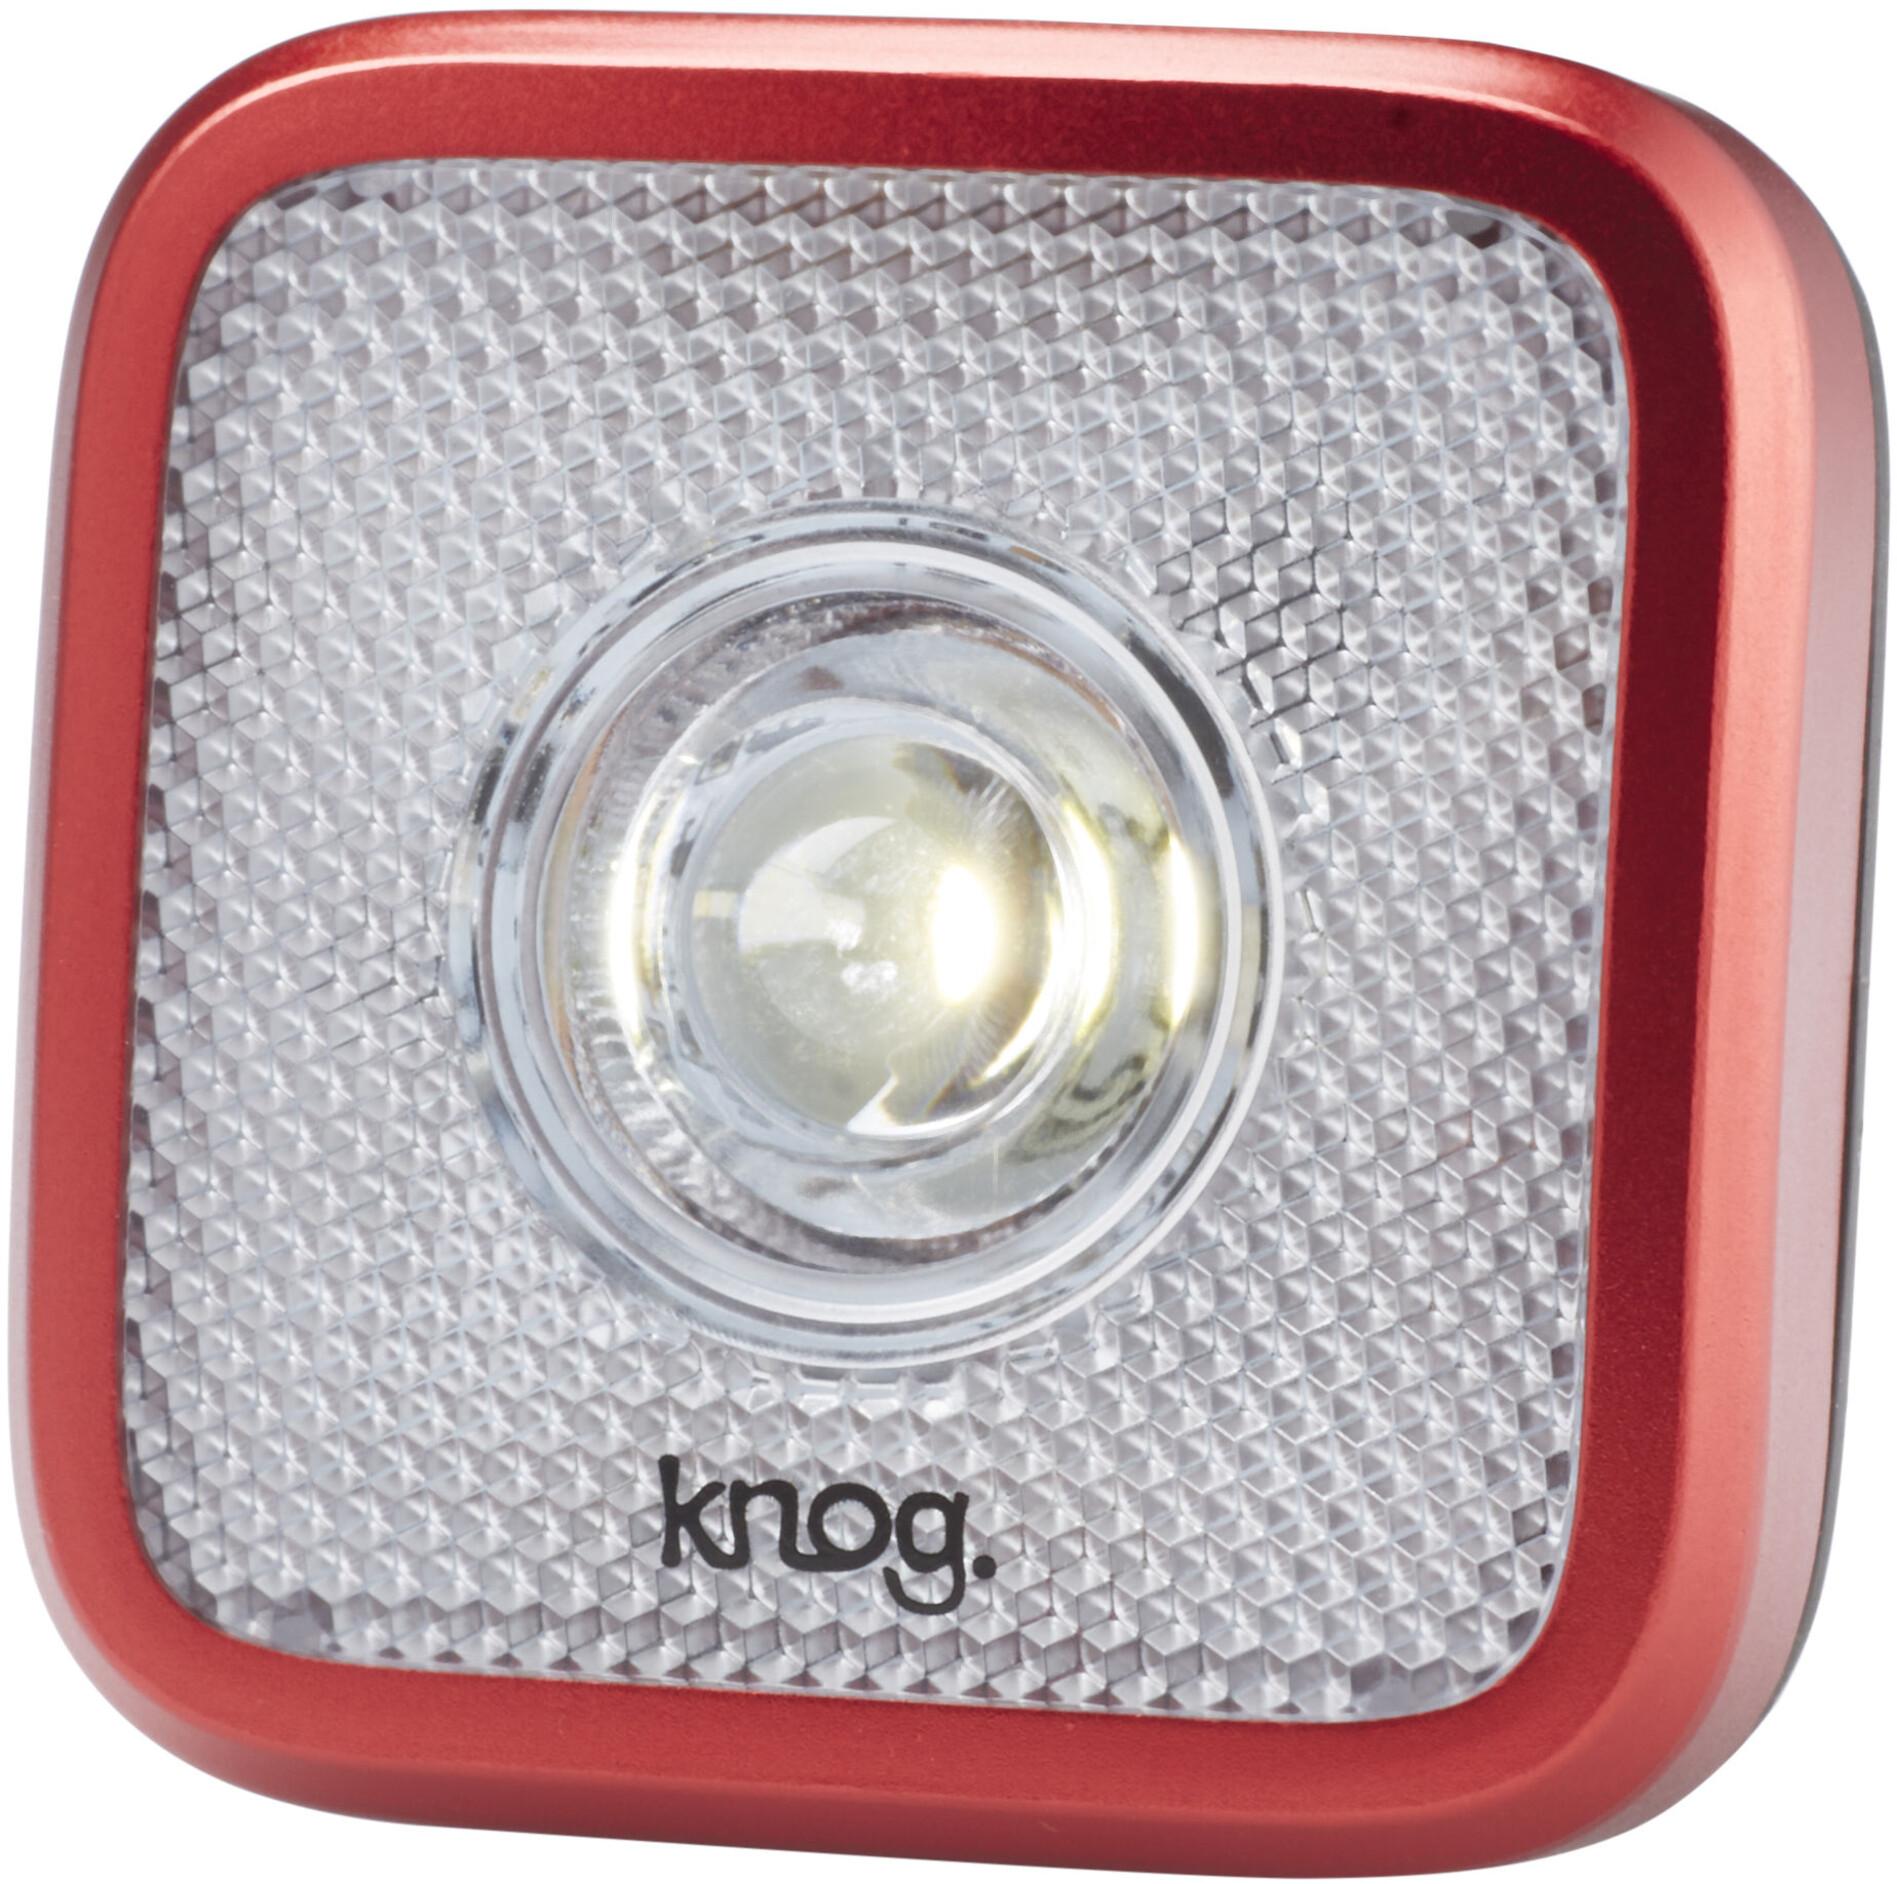 d32c0f70e Knog Blinder MOB Eyeballer - Luces para bicicleta - 1 LED blanco, estándar  rojo